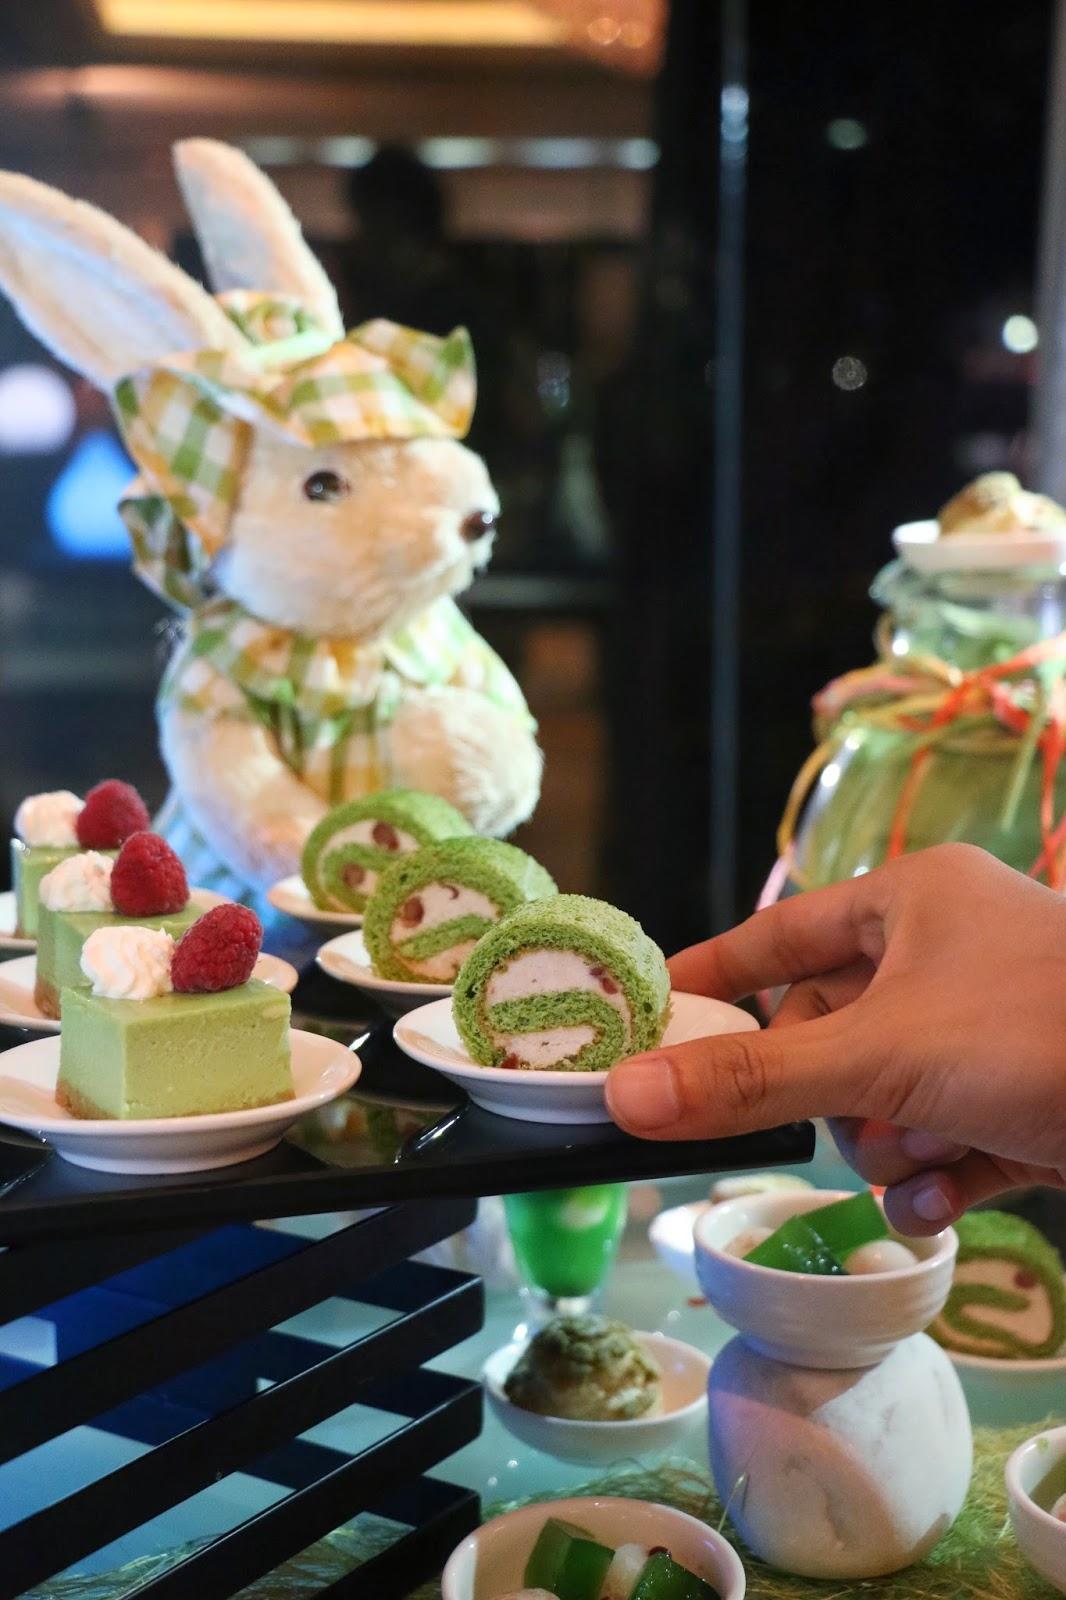 Kowloon Shangri-La, Matcha Green Tea, Shang Palace, Nadaman, Matcha Swiss Roll, Cafe Kool, Lobby Lounge